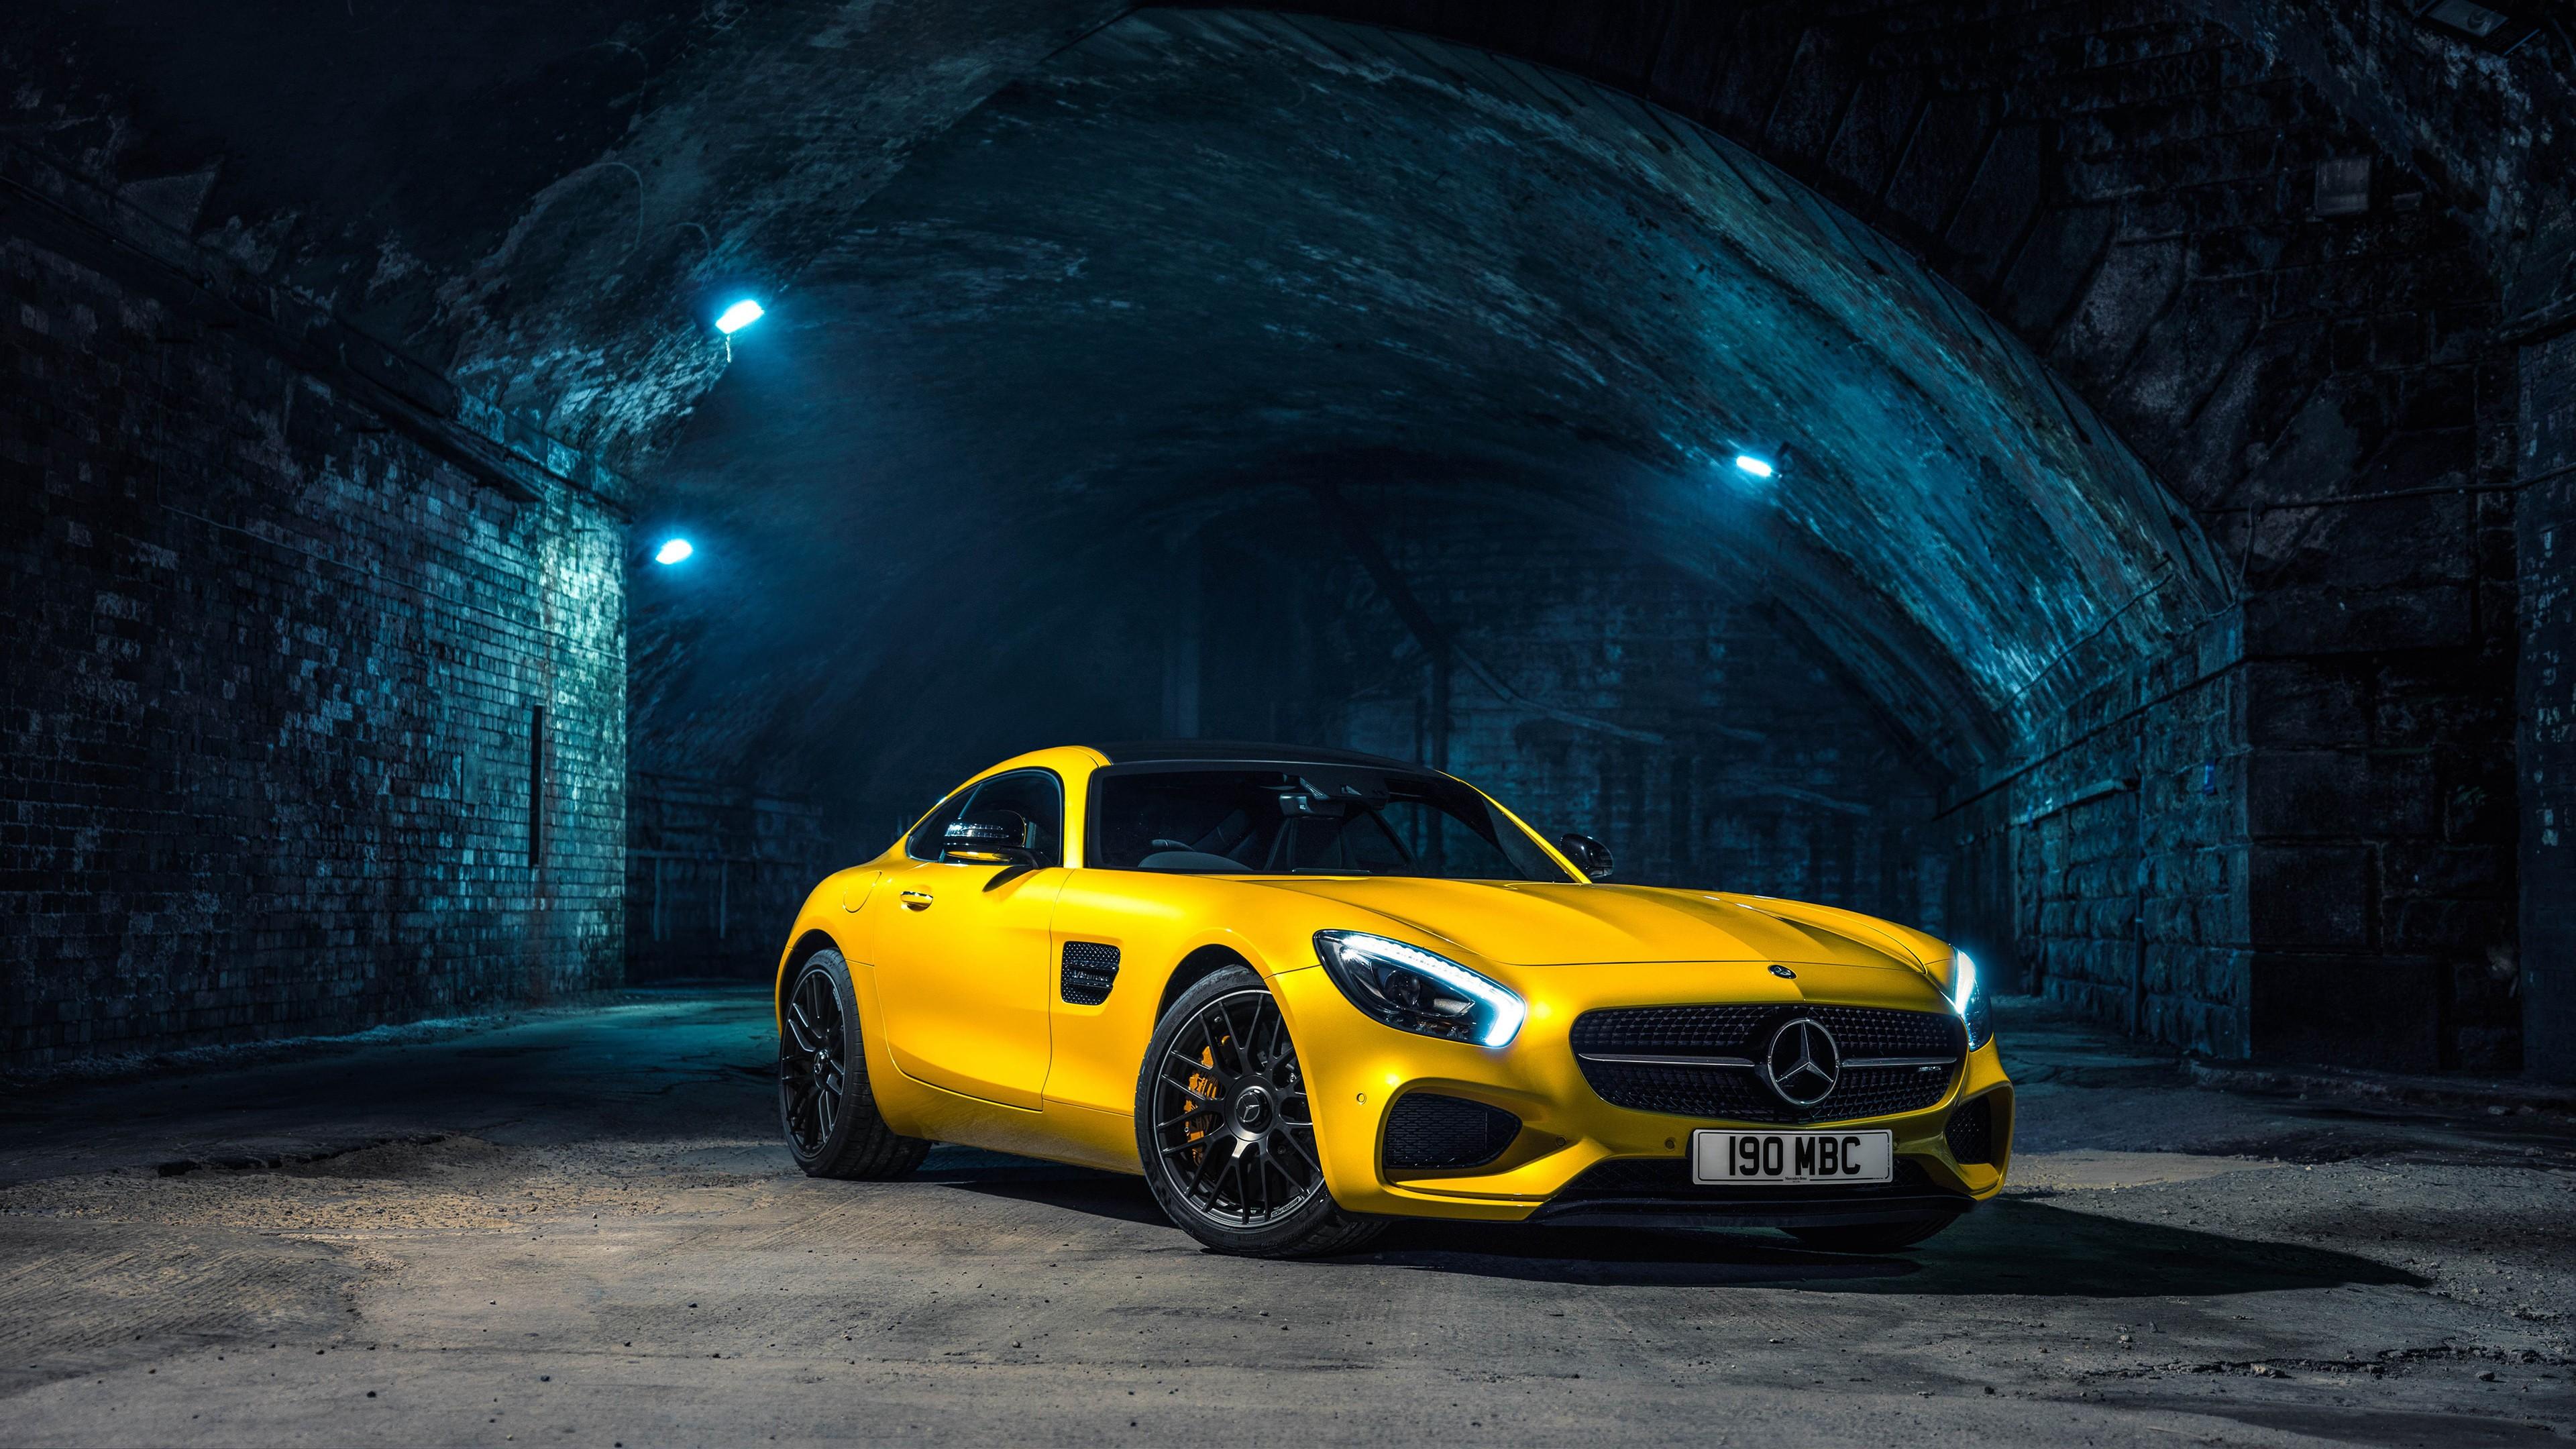 2015 Mercedes Amg Gt S Wallpaper Hd Car Wallpapers Id 5745